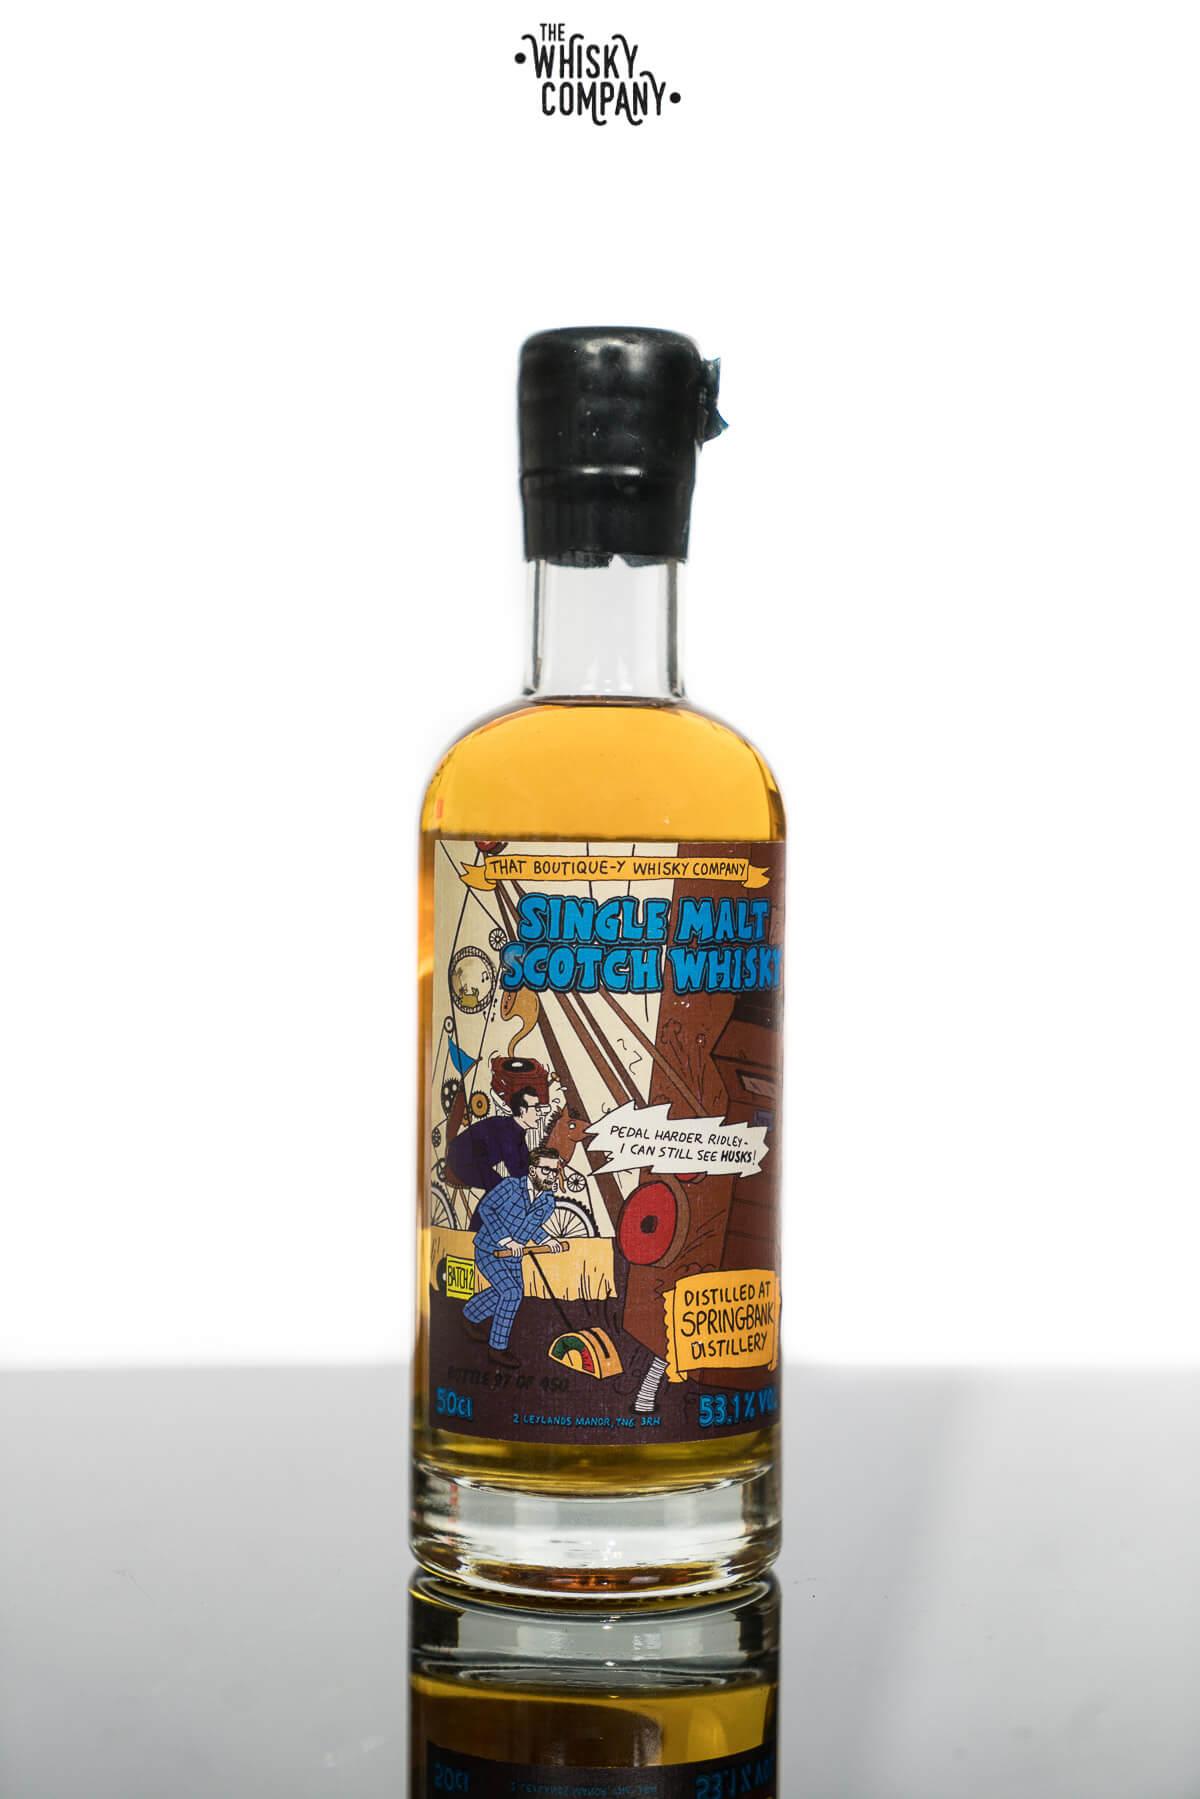 Springbank Batch 2 Single Malt Scotch Whisky - That Boutique-Y Whisky Company (500ml)